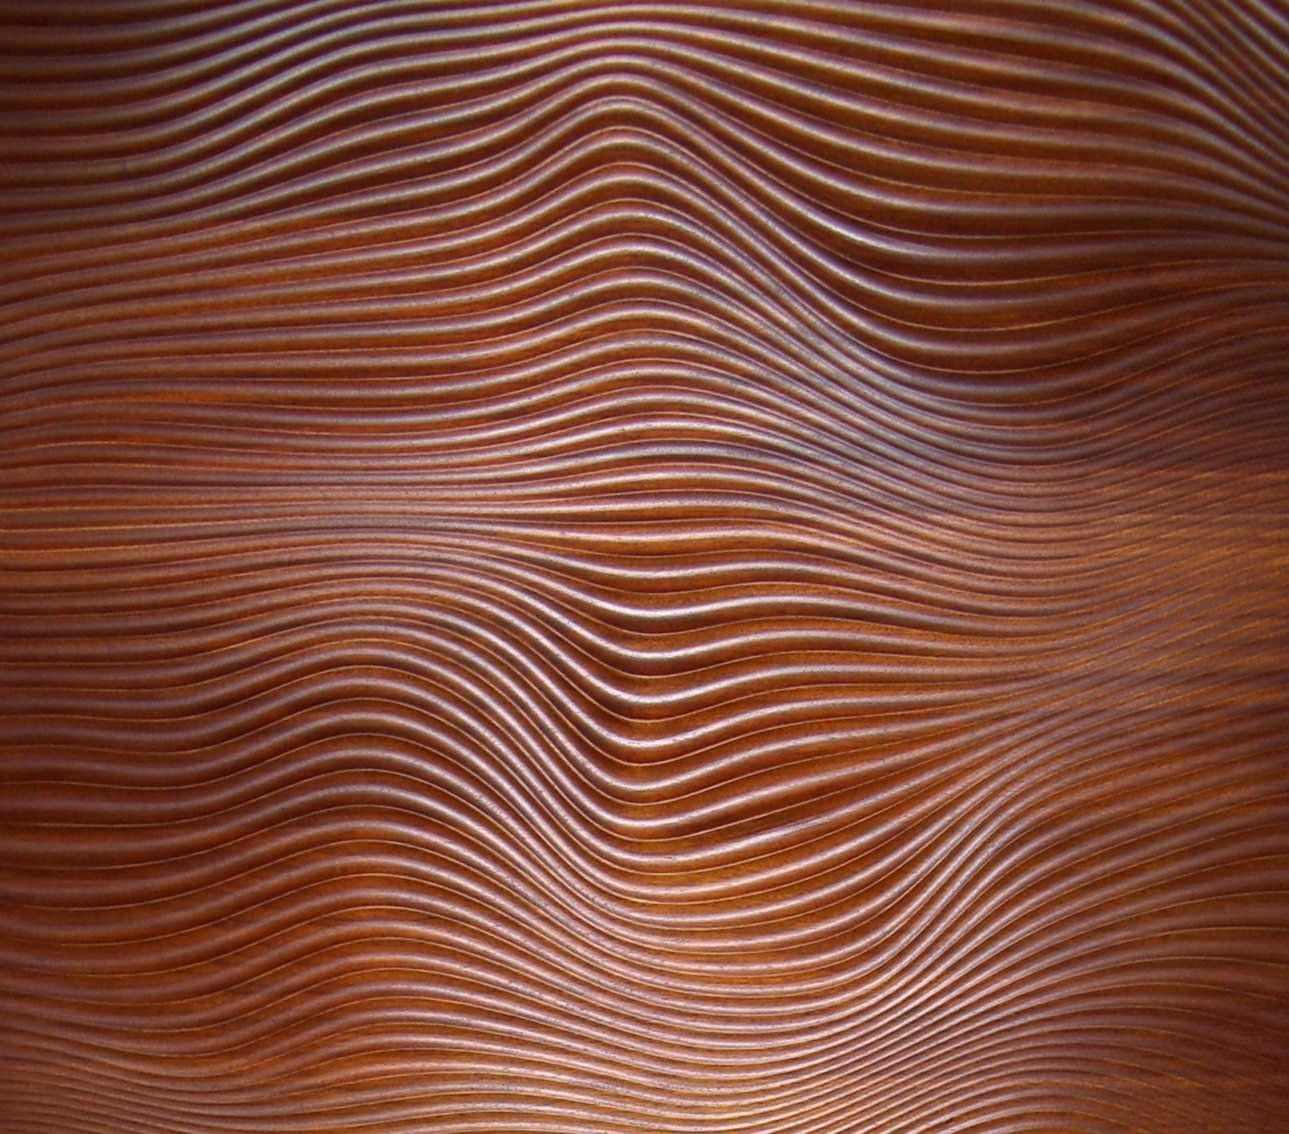 wooden decorative wall panels photo - 6 | Theater | Pinterest ...